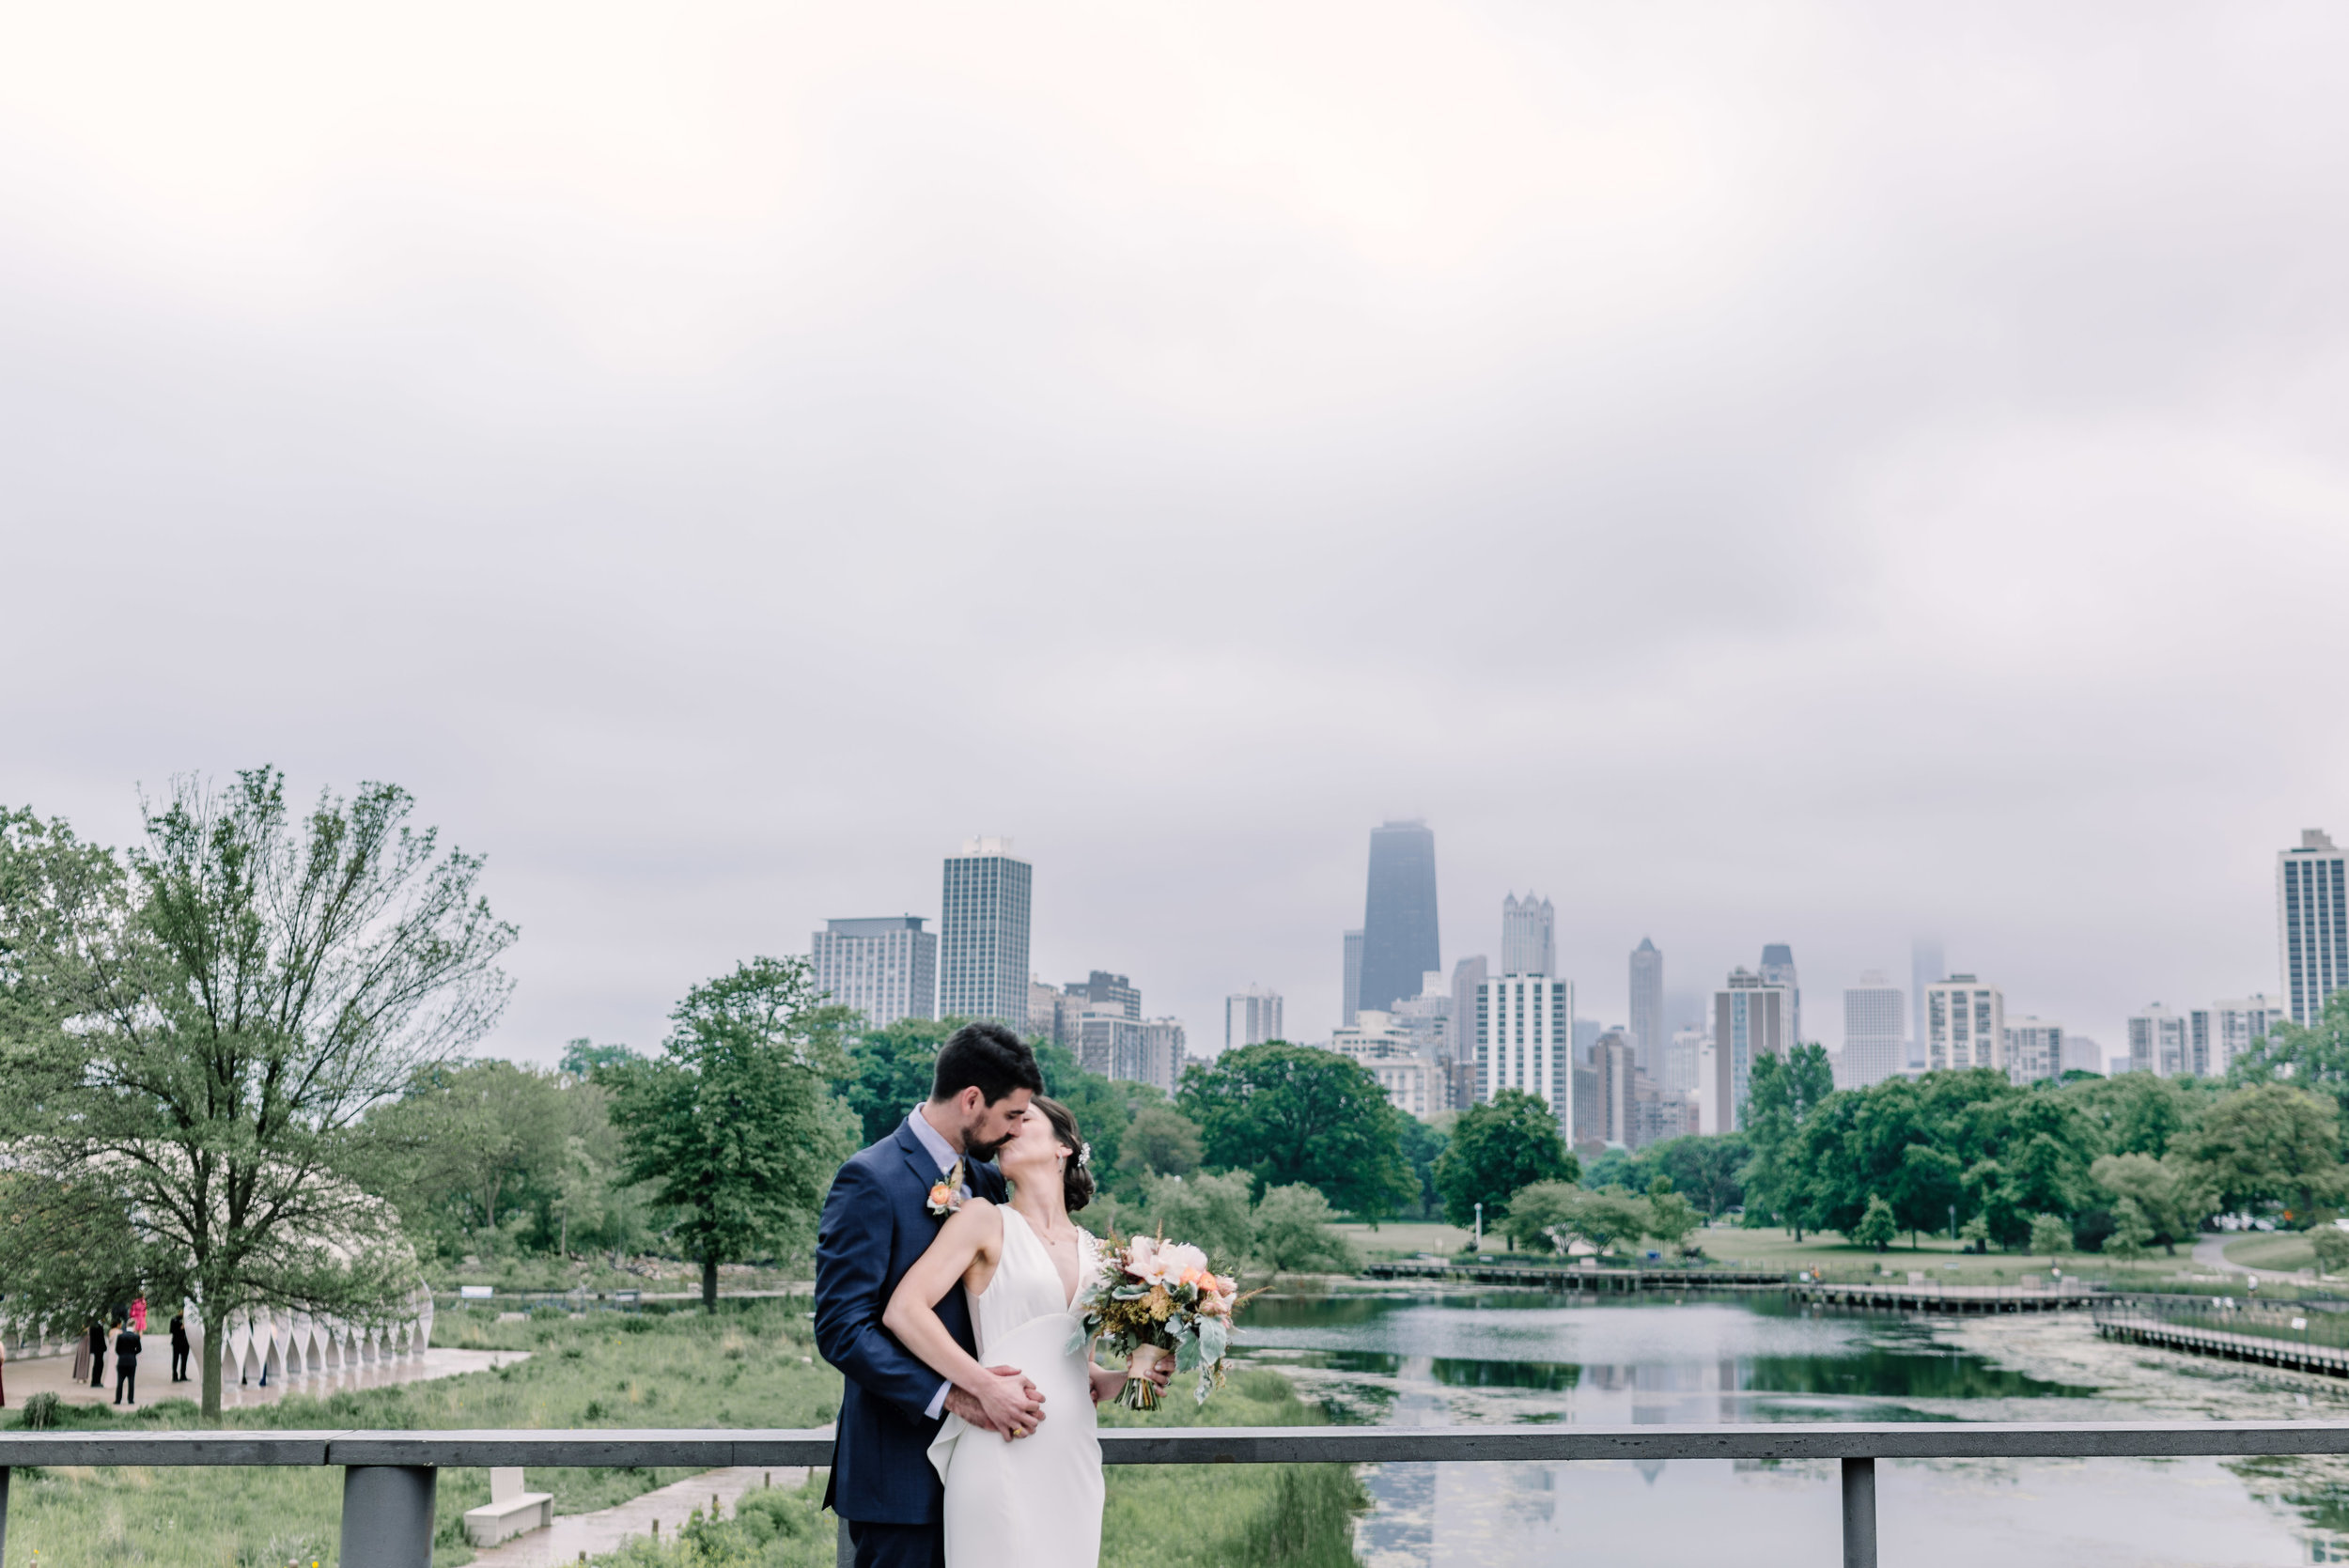 Patricia-Steve-Blog-Indianapolis-Wedding-38.jpg